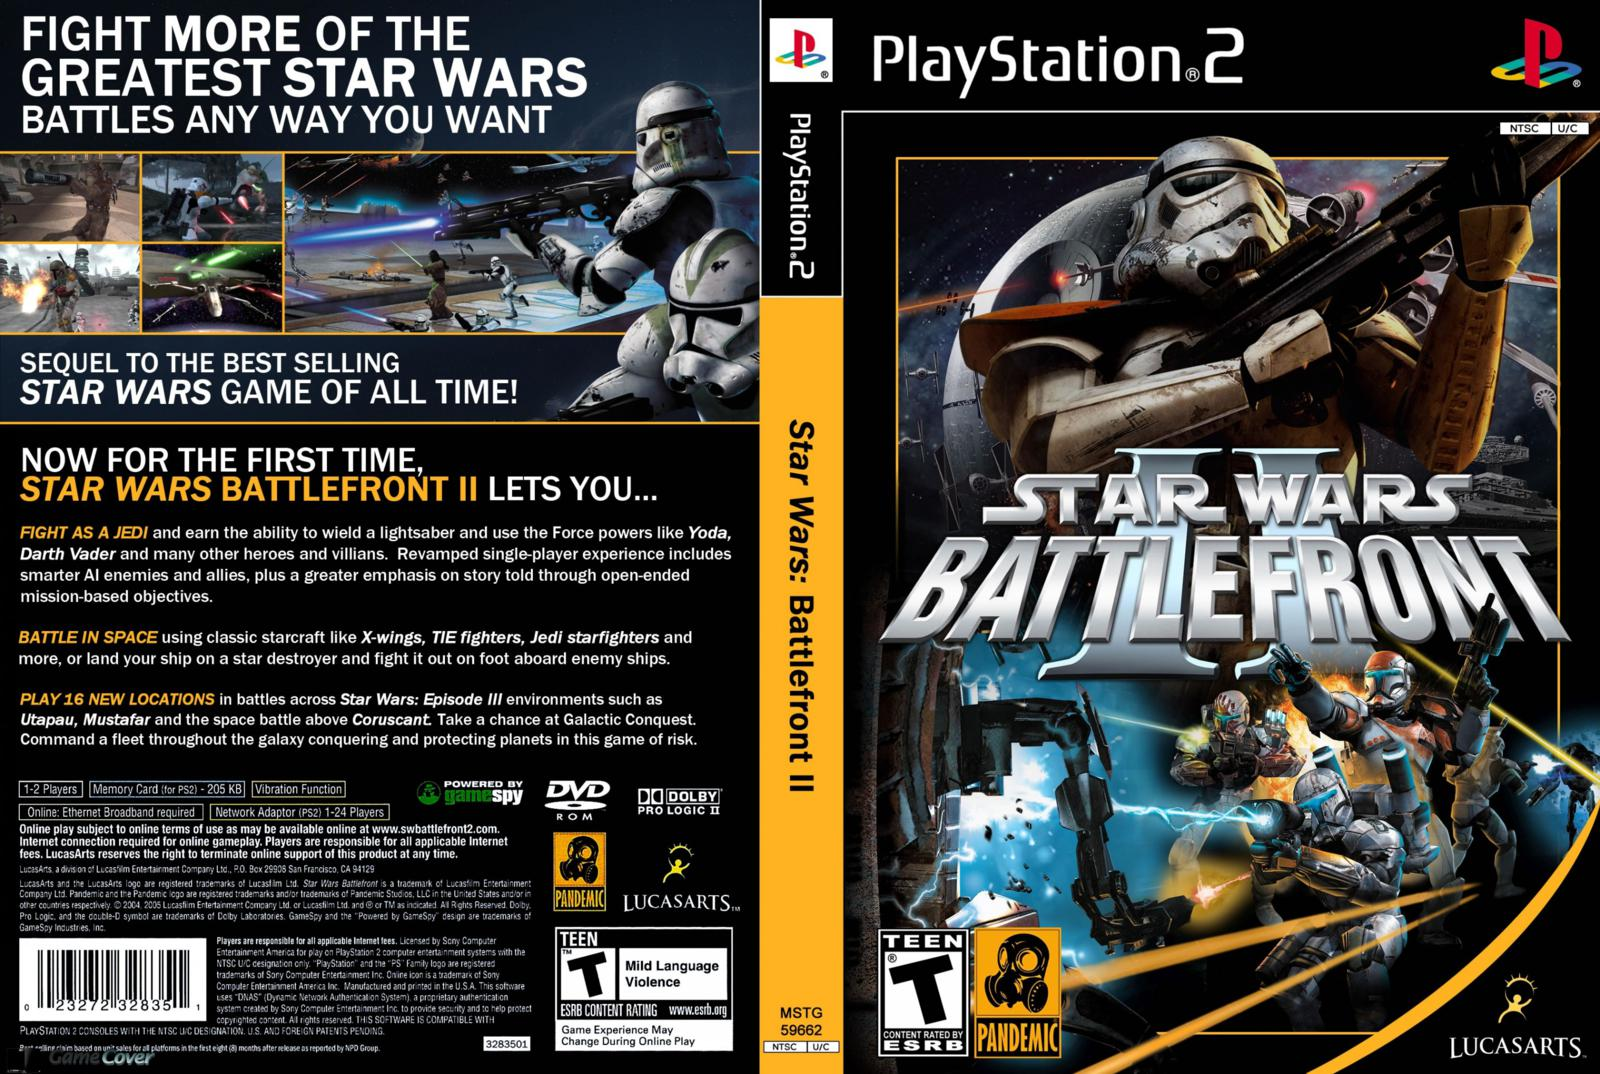 Avis images du web pour star wars battlefront ii sur playstation 2